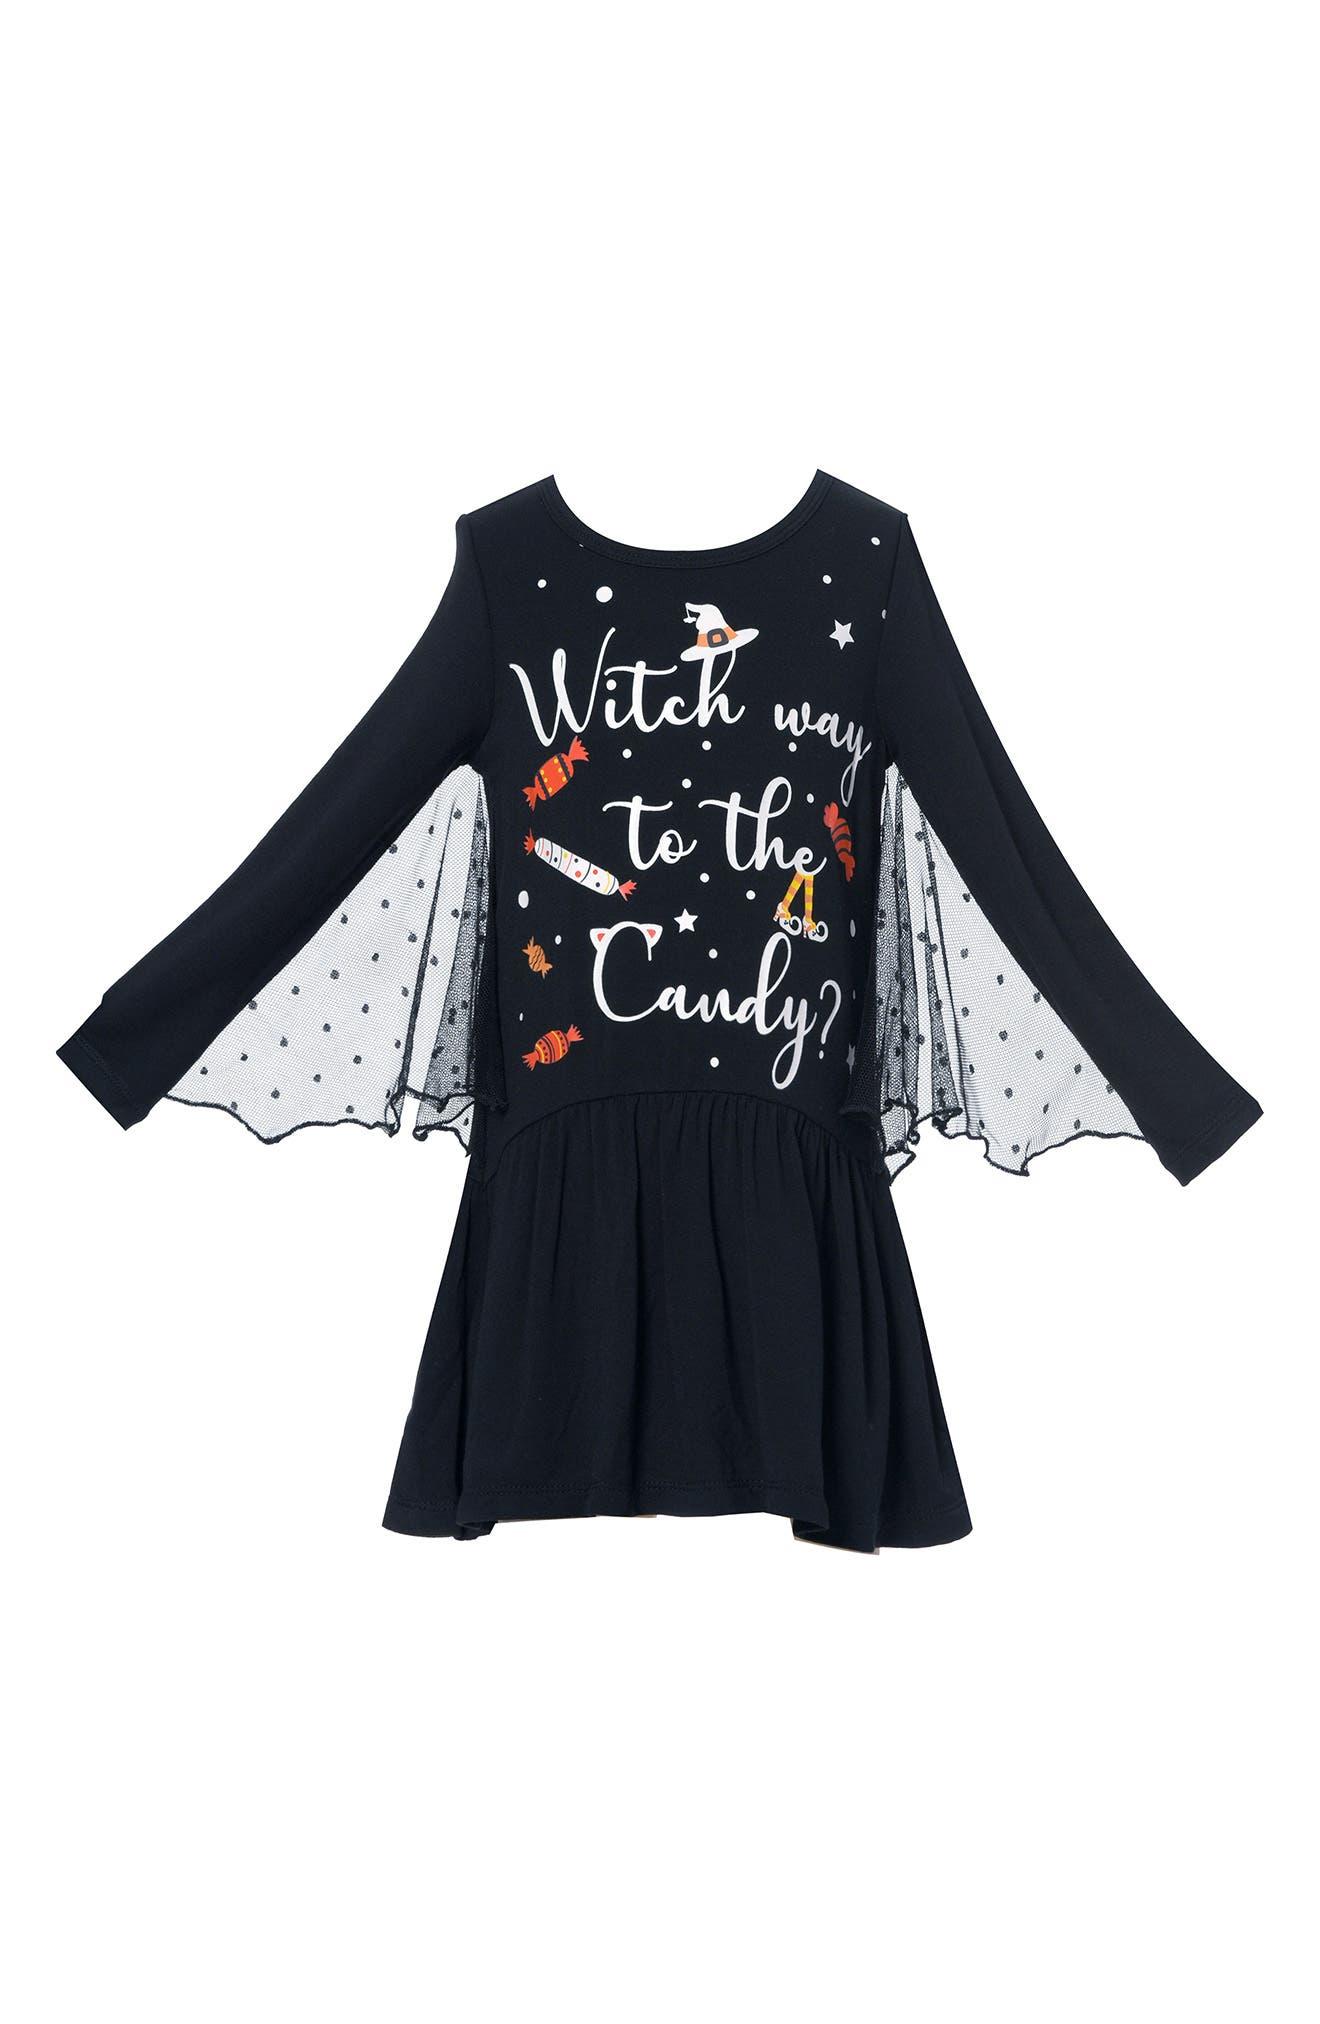 Image of Truly Me Kids' Bat Wing Glow in the Dark Long Sleeve Dress